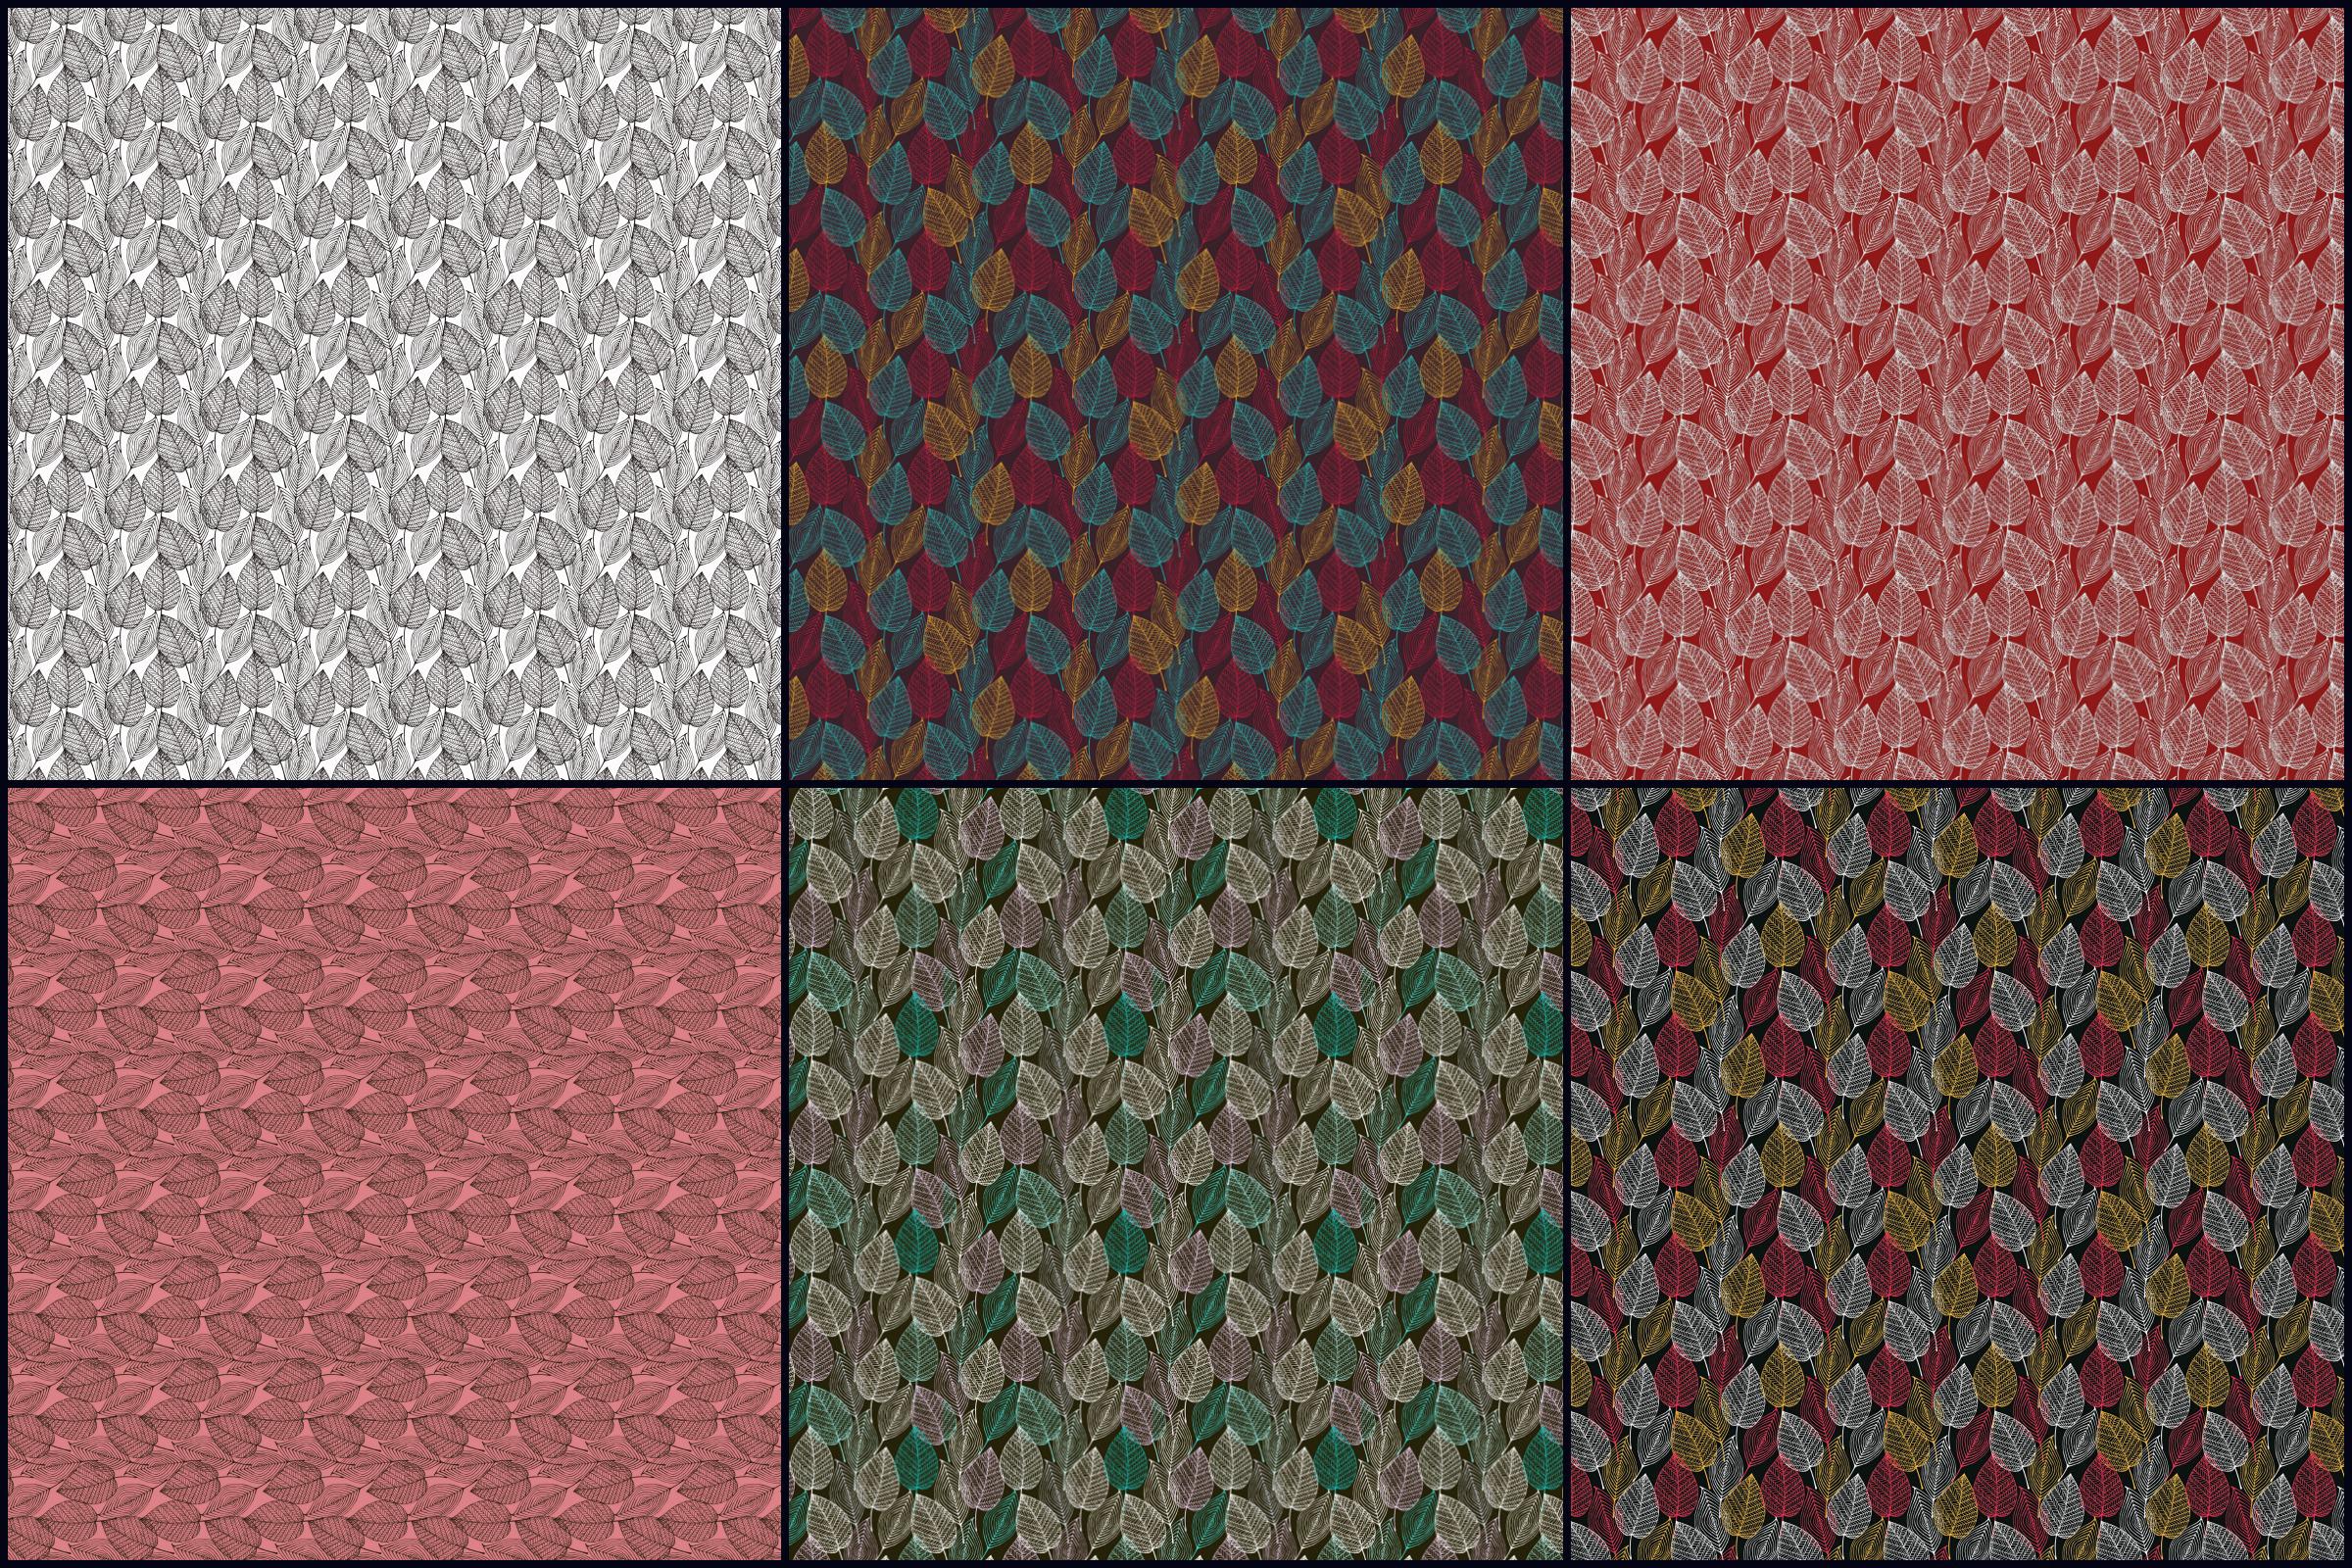 Lacy Skeleton Leaf Patterns Digital Paper Pack example image 2